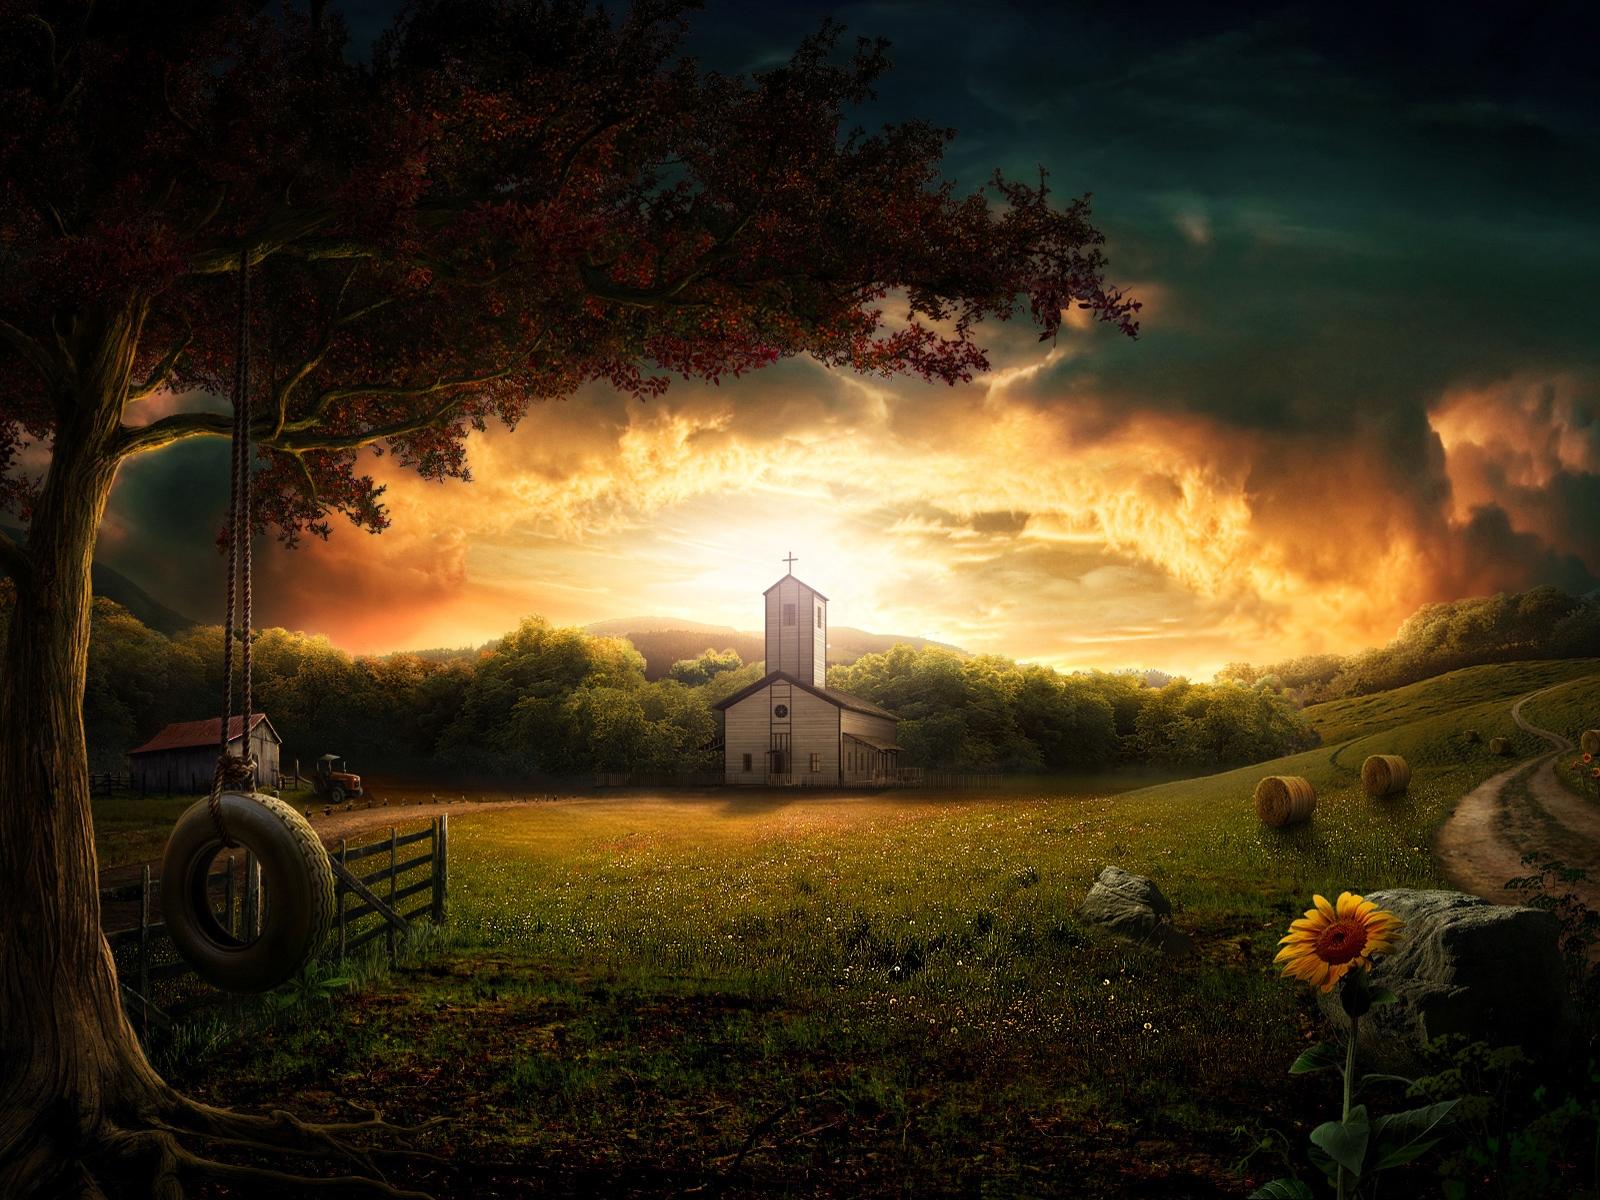 https://3.bp.blogspot.com/-BD-Tfzju9-I/UA9wn1bGHAI/AAAAAAAAEi4/1EcE34Uf8Cc/s1600/wallpaper-hd-image.jpg